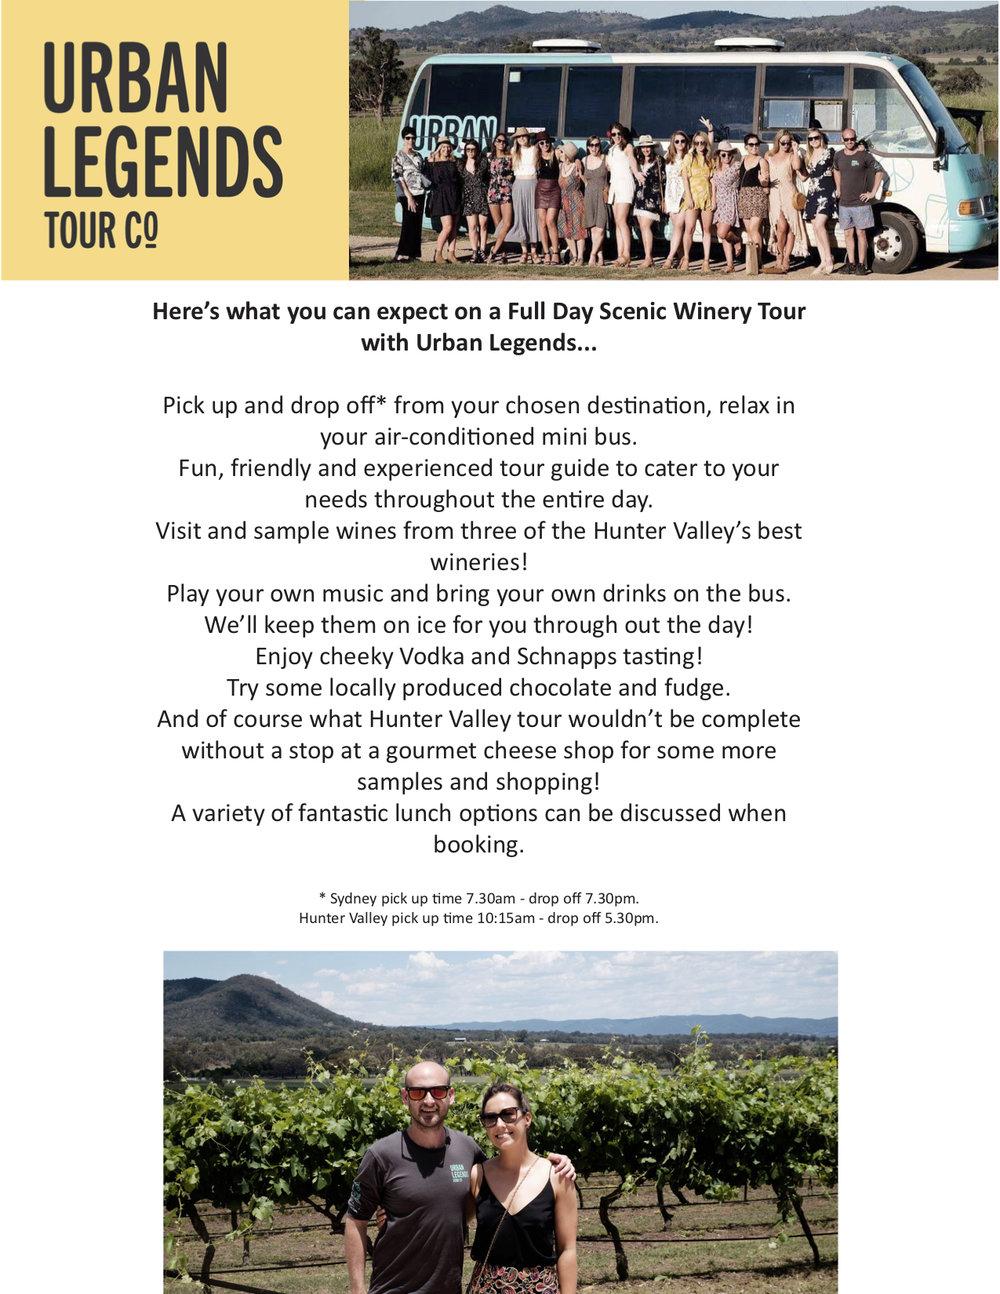 JPG Marketing brocure - Winery tour.jpg